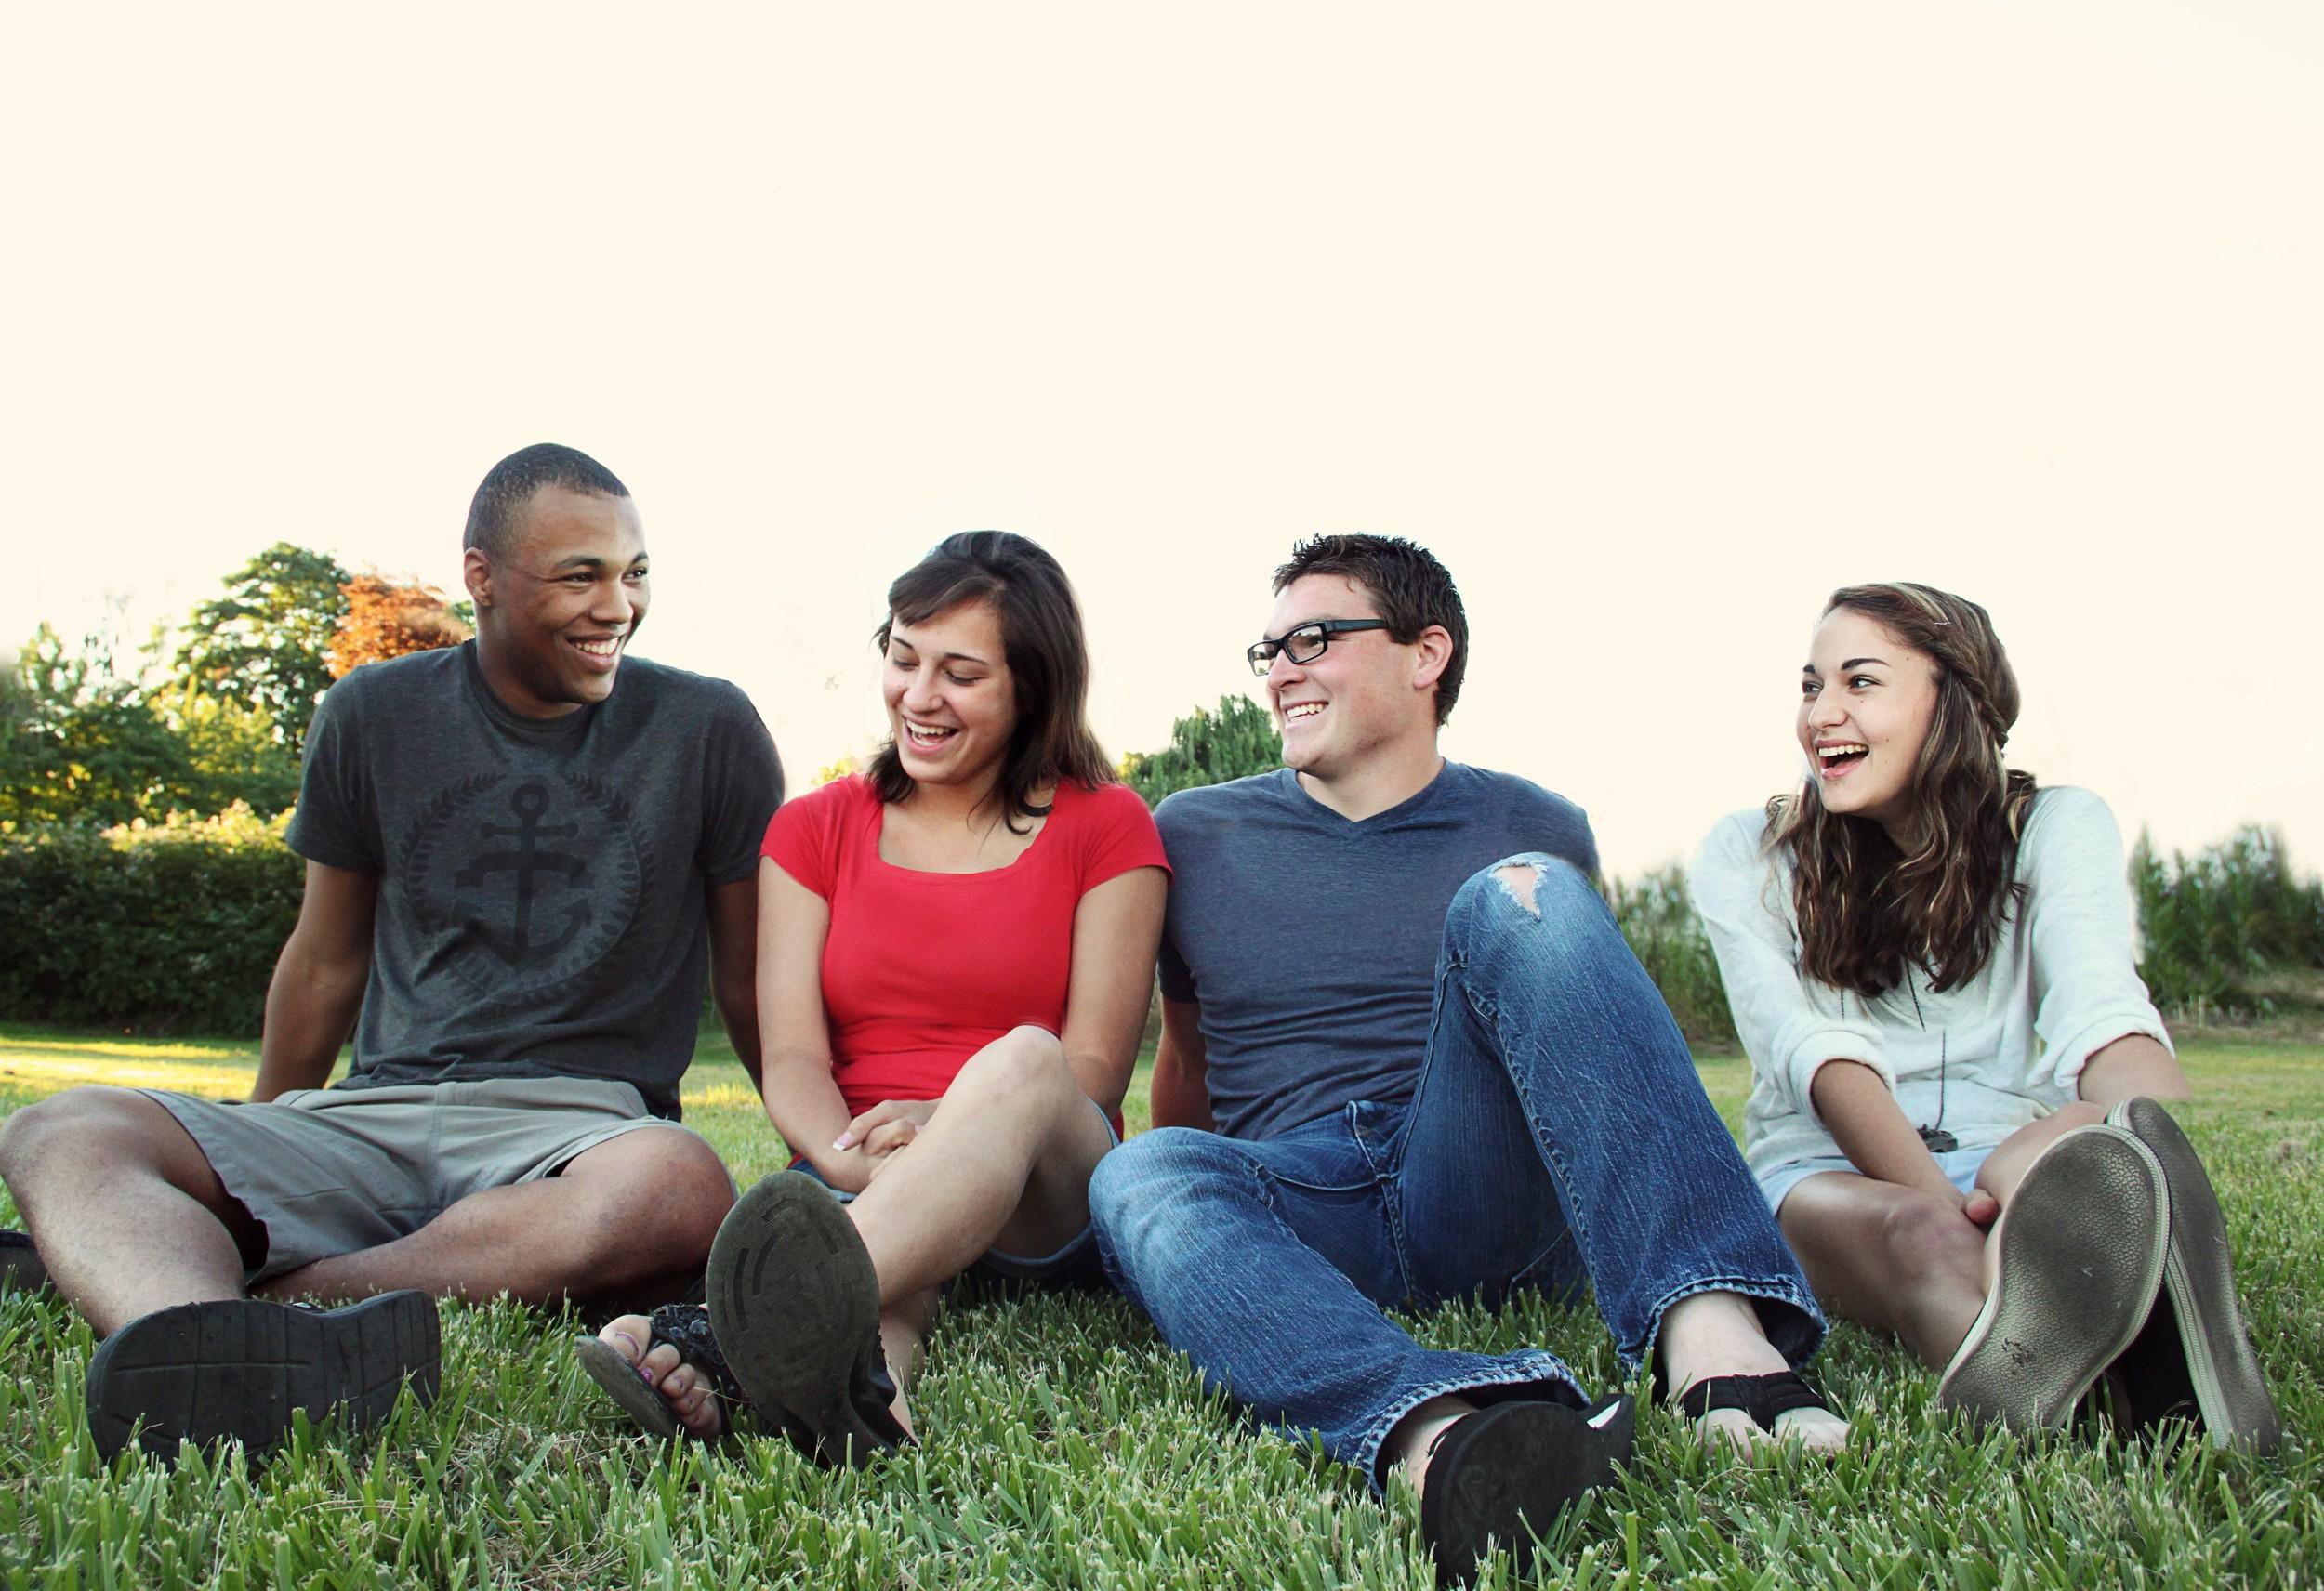 Youth-Ministry-Christian-Stock-Photos.jpg